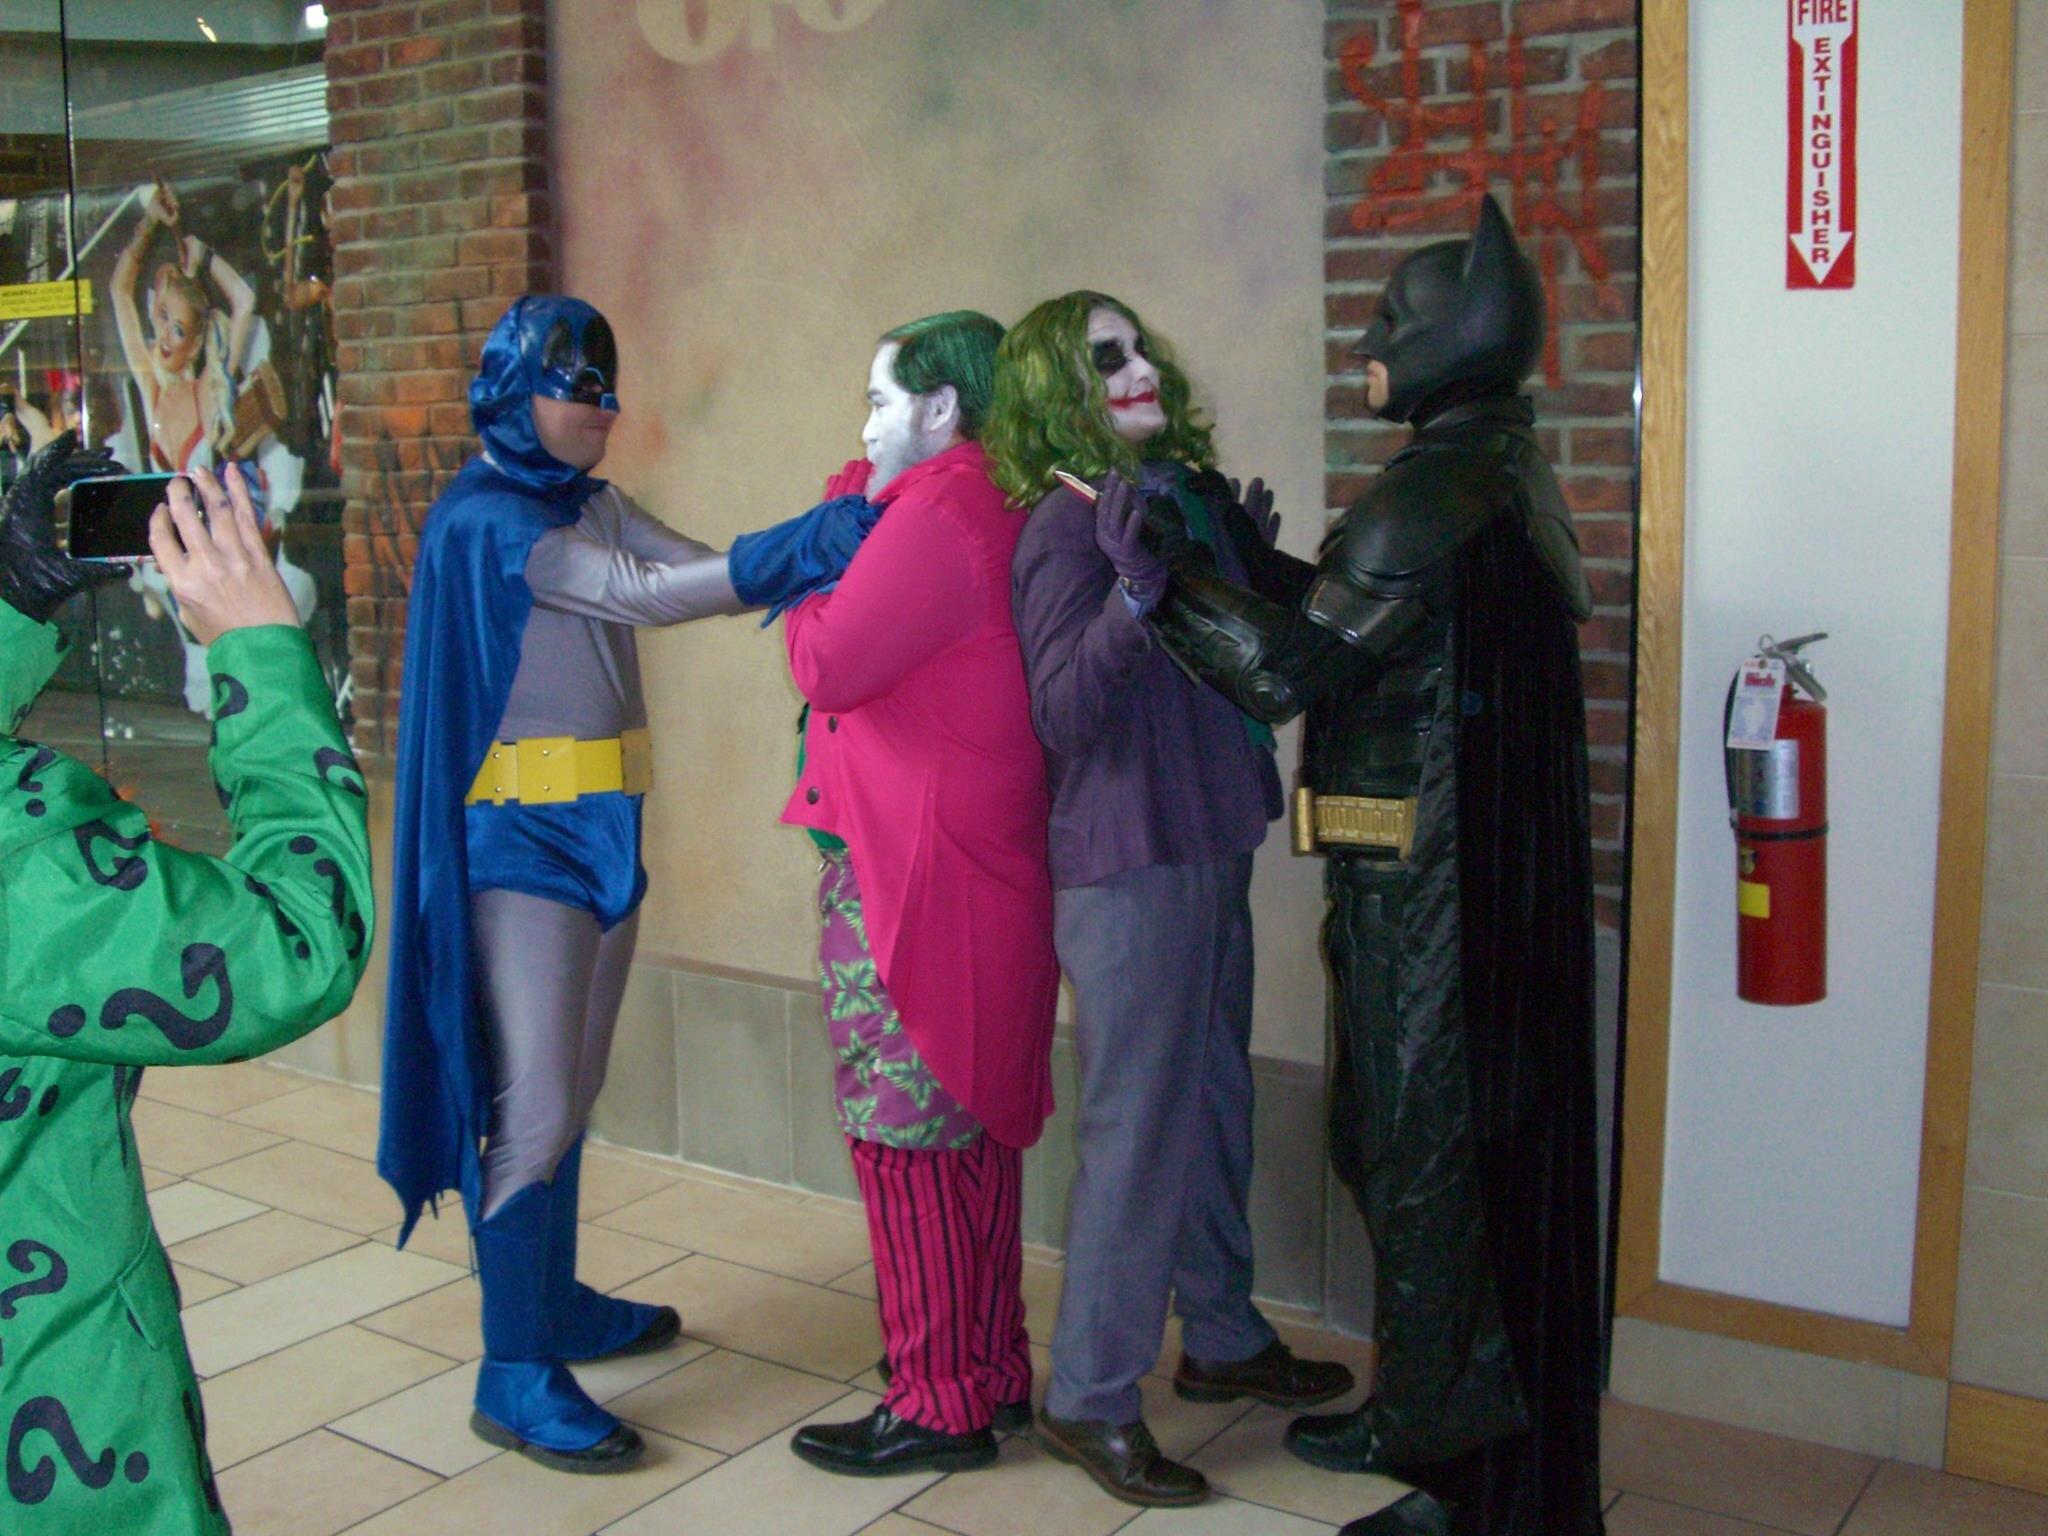 Batman ages crossover on Batman Day!